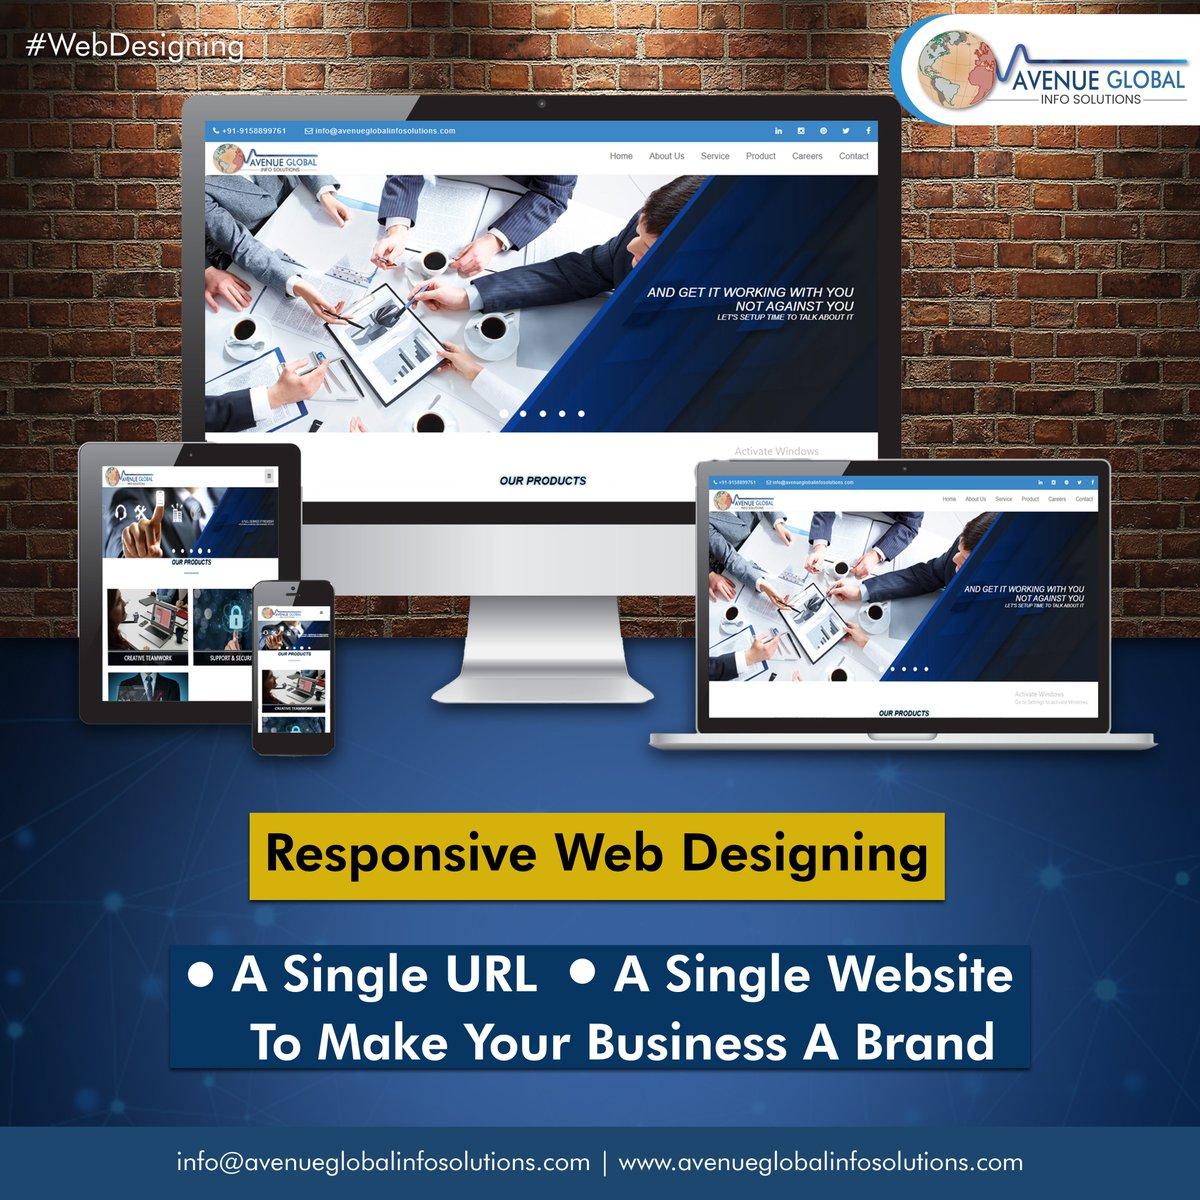 All You Need a Responsive Web Desiging To Make Your Business a Brand! #webdesign #whywebdevelopment #webdesigncompany #websitedeveloper #webdesigntips #instatech #instatechno #socialmediamarketing #Avenueglobalinfosolutions #avenueglobal #AGIS #Webdesigning #Digitalmarketingpic.twitter.com/4tZ5plVGAM